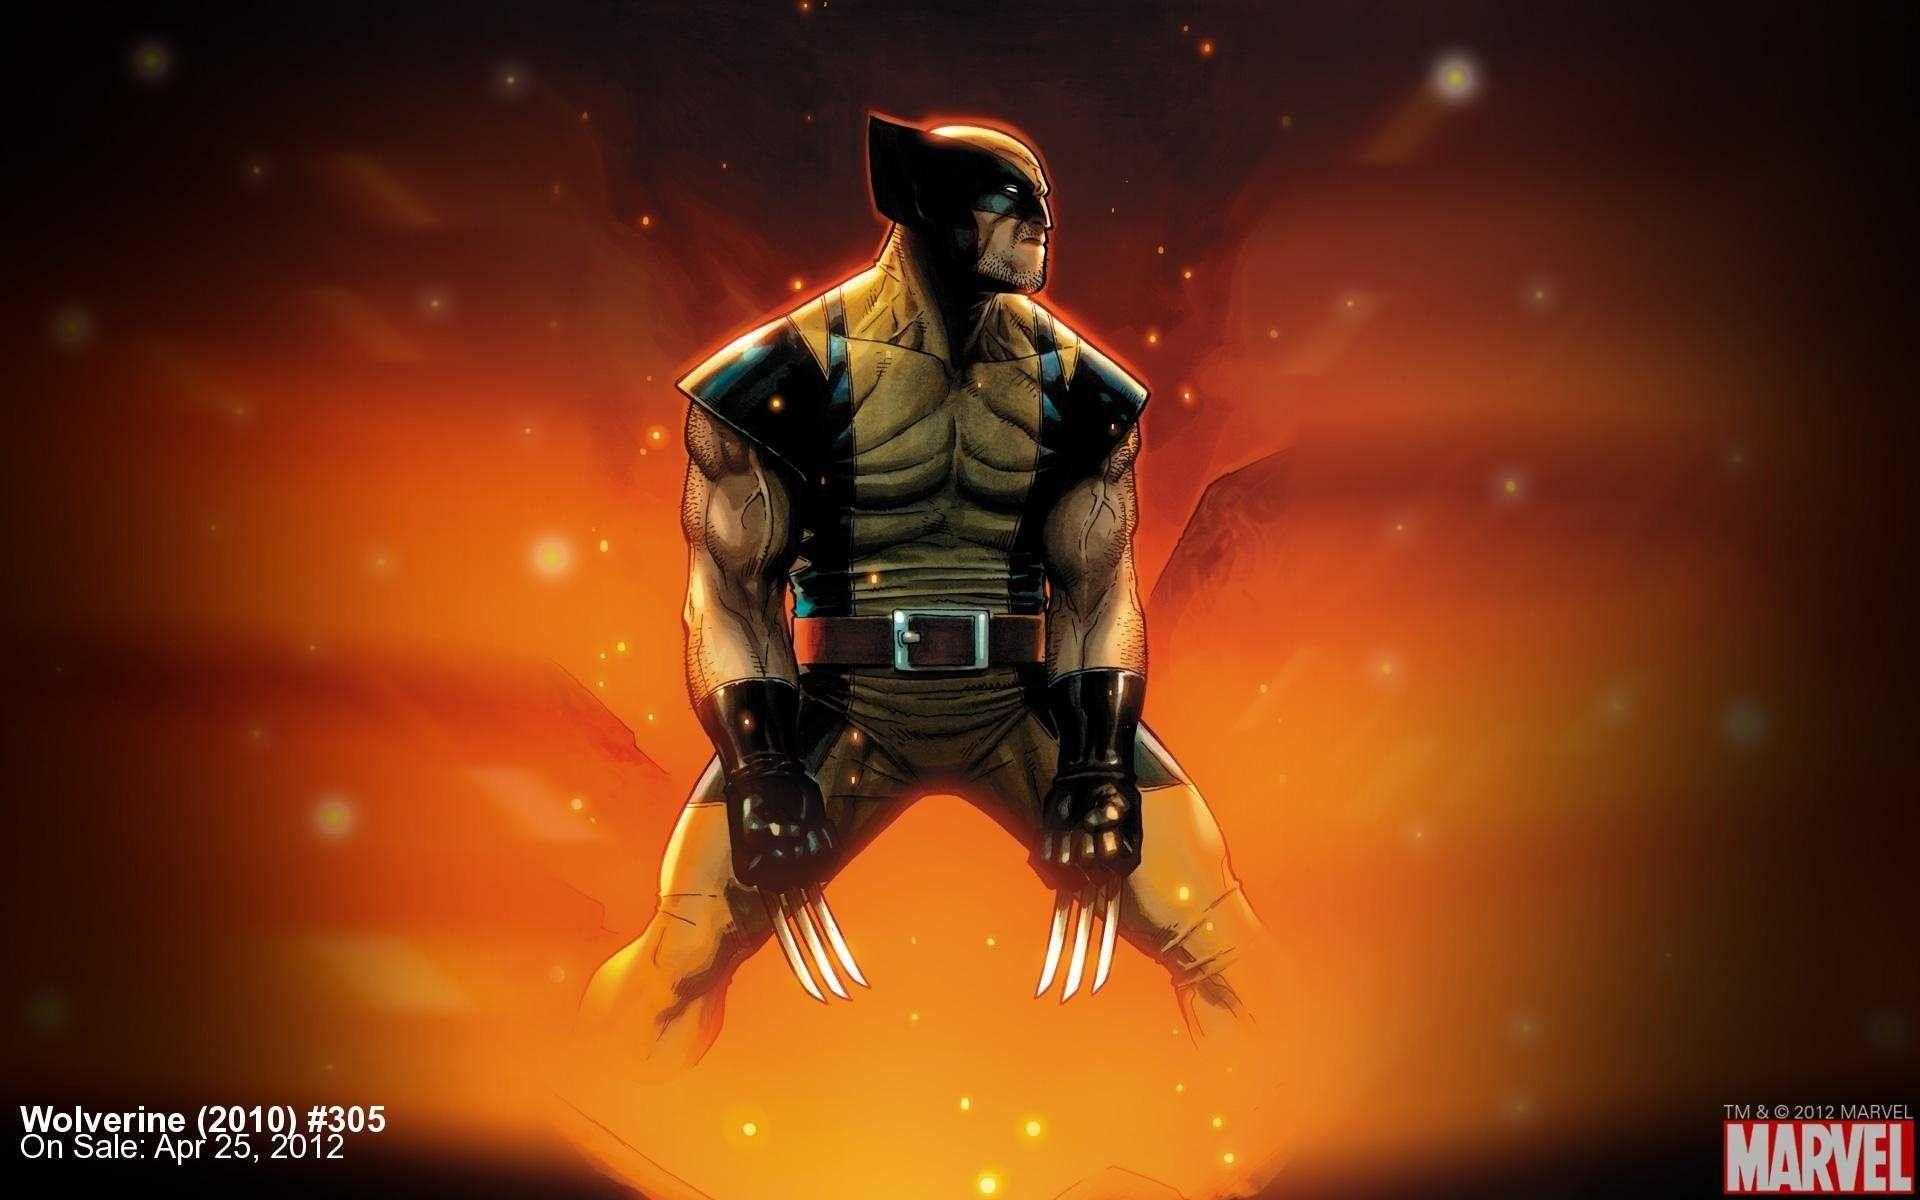 Wolverine laptop wallpapers top free wolverine laptop backgrounds wallpaperaccess - Wallpaper wolverine 4k ...